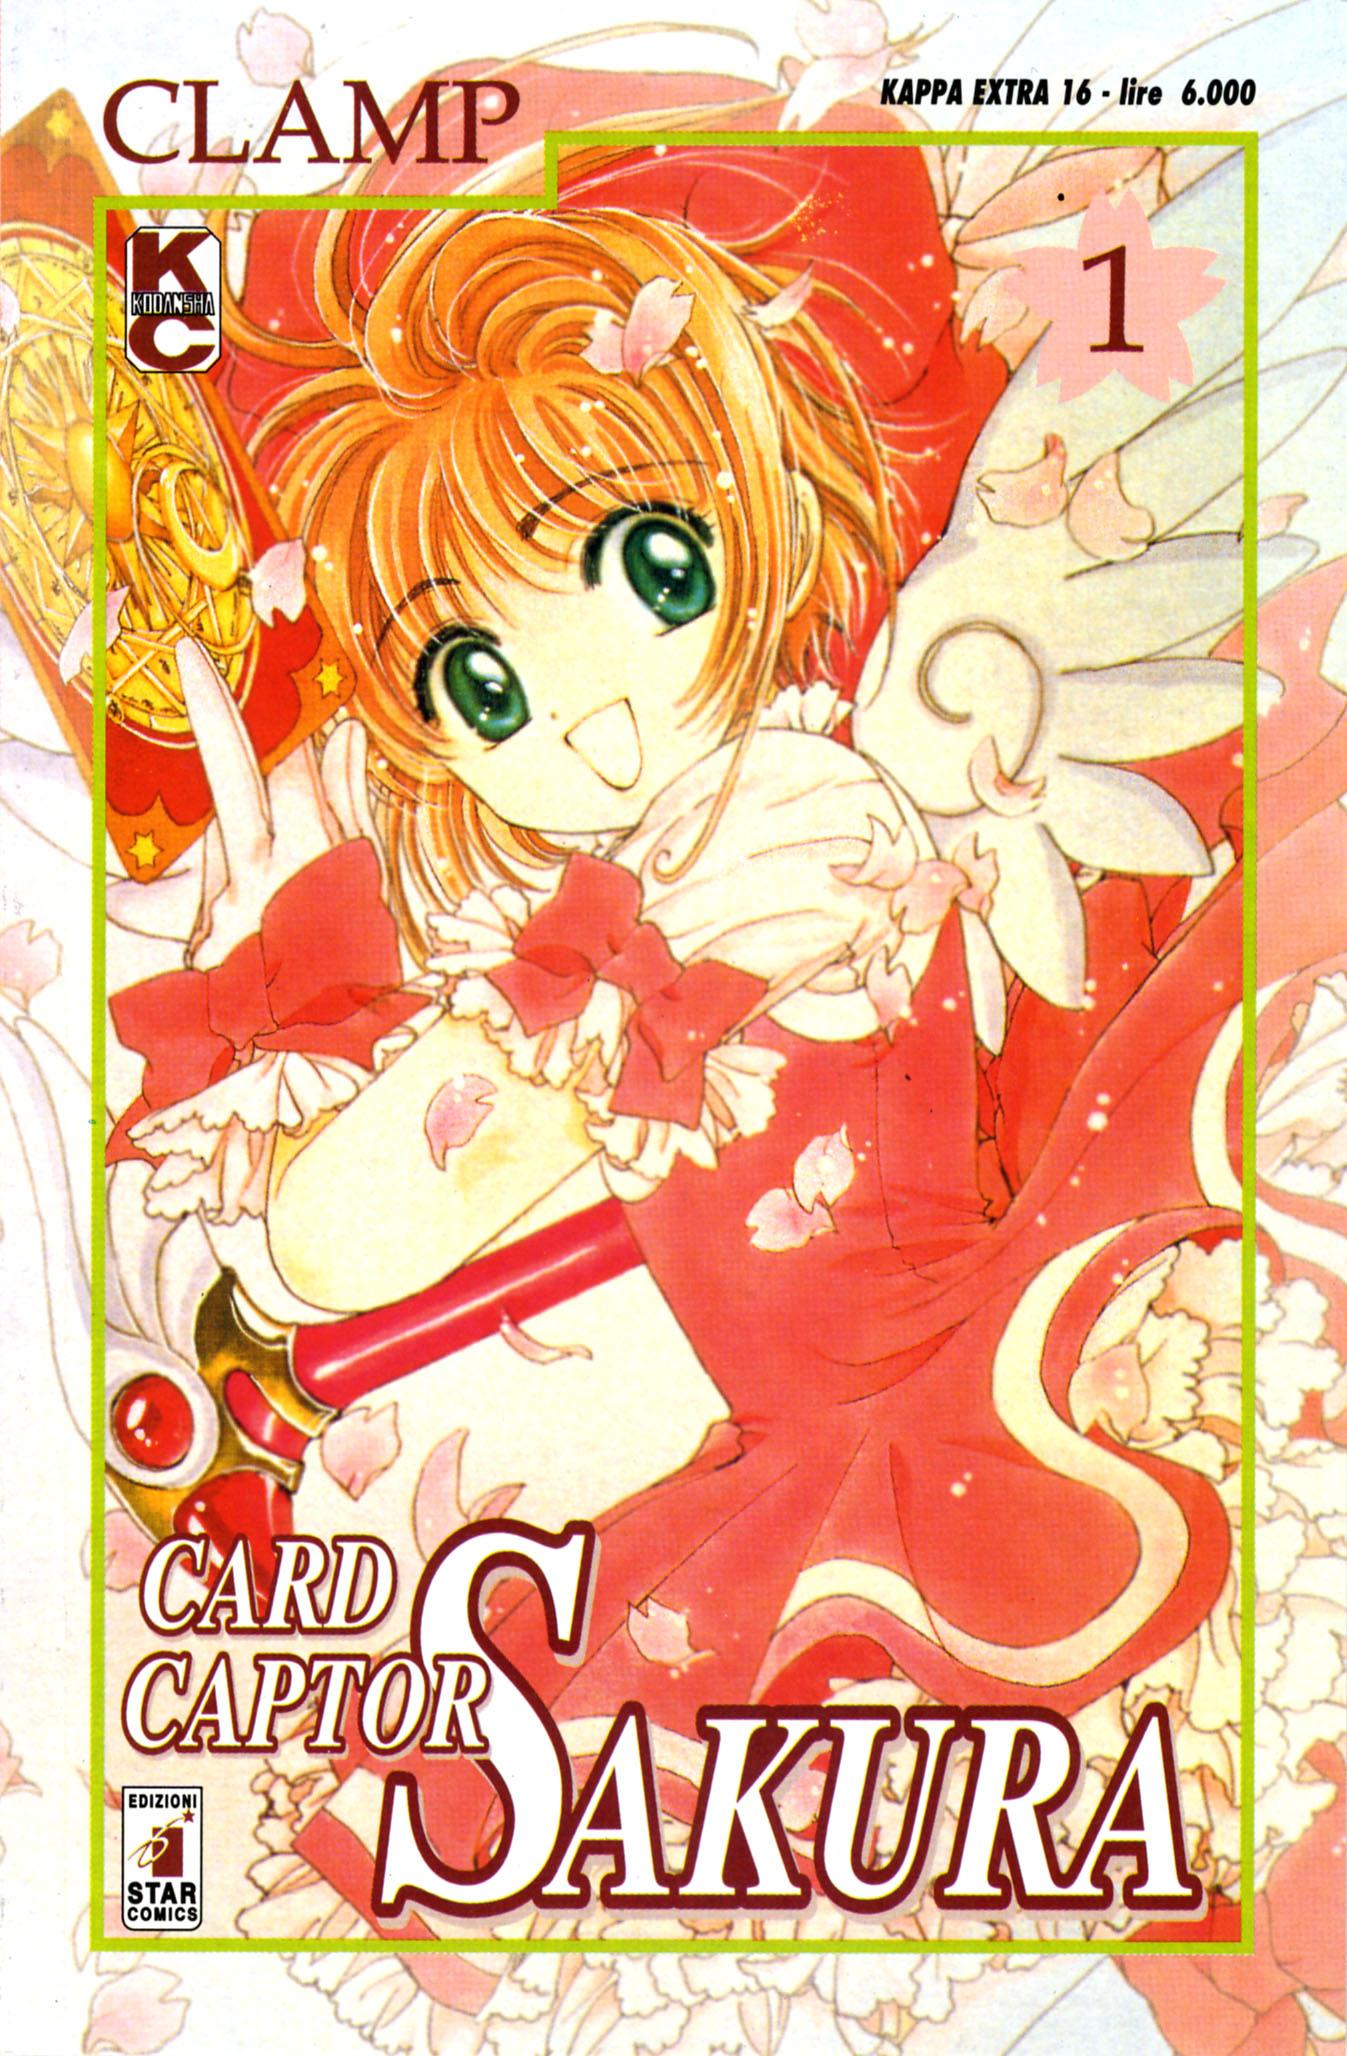 Card Captor Sakura Wikipedia